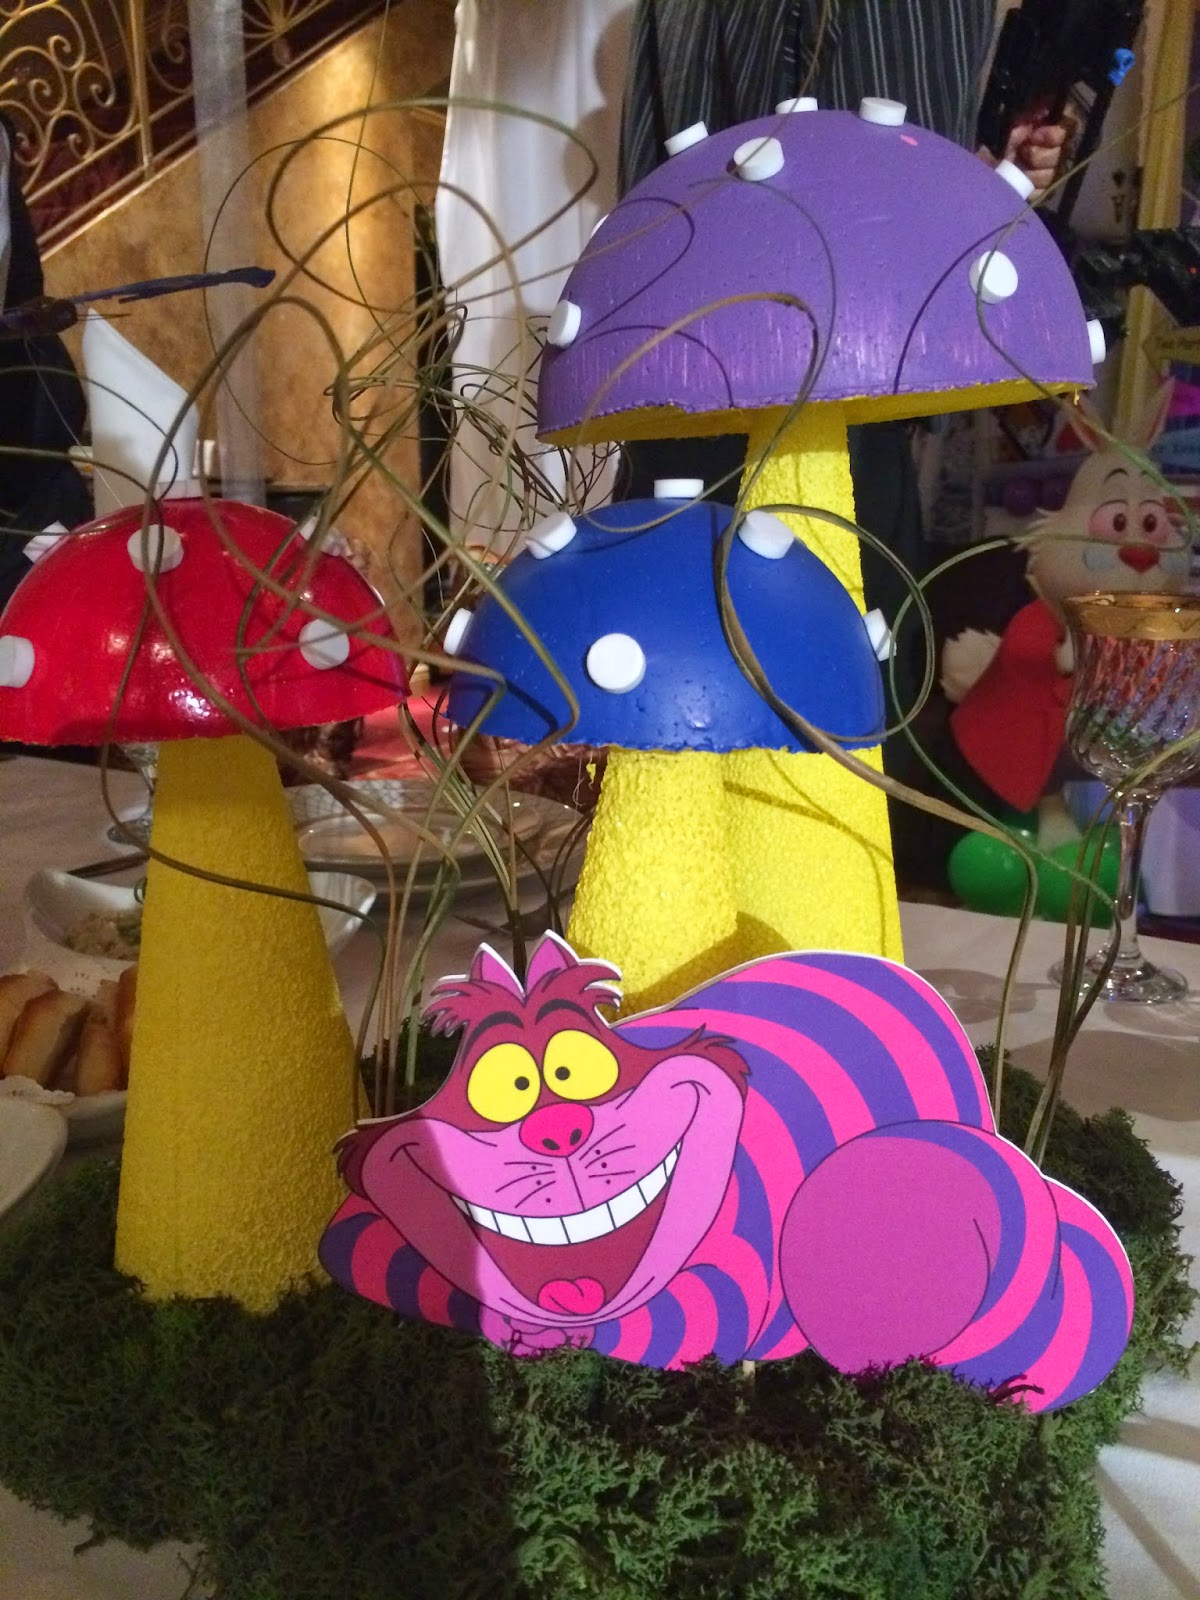 Alice In Wonderland Decorations Dreamark Events Blog Alice In Wonderland Theme Tea Party Decoration